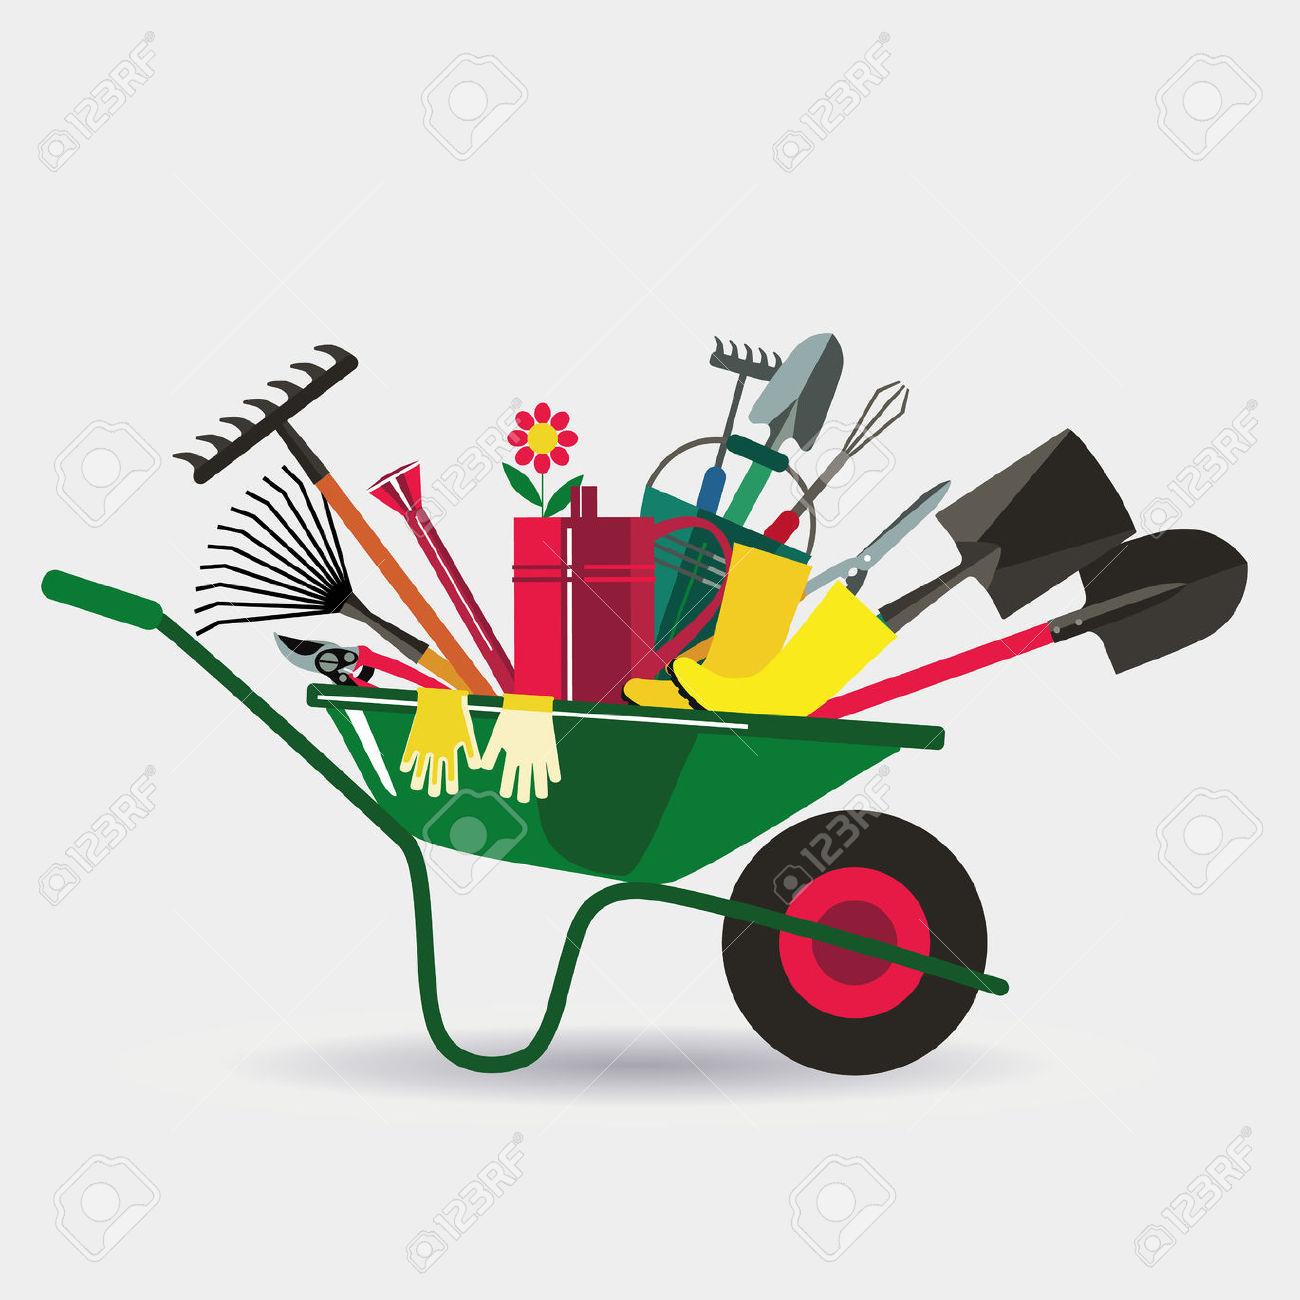 Organic Farming. Wheelbarrow With Tools To Work In The Garden.